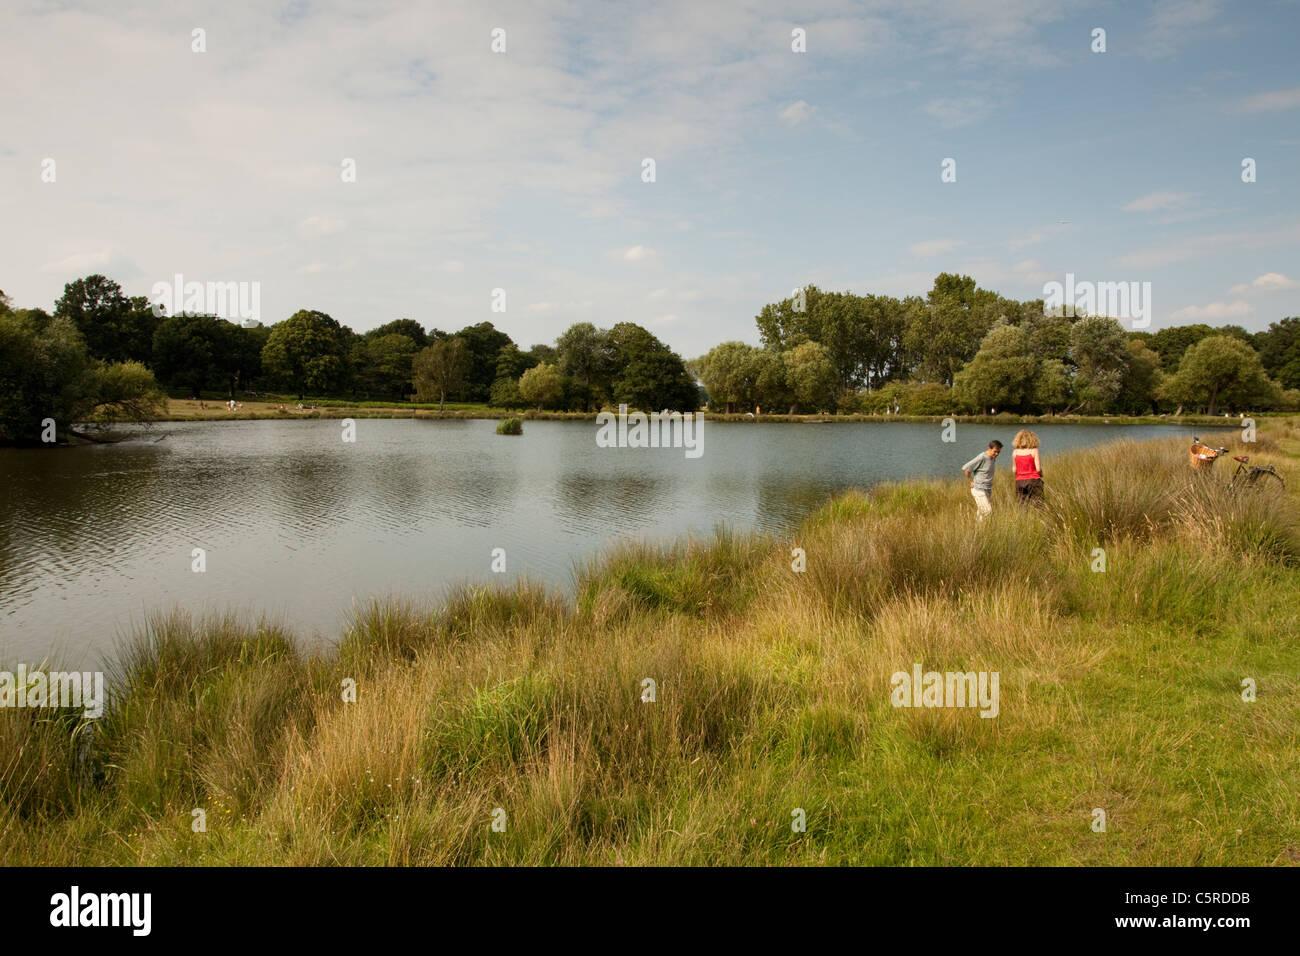 Richmond park Teich/See, Surrey, England, UK Stockbild